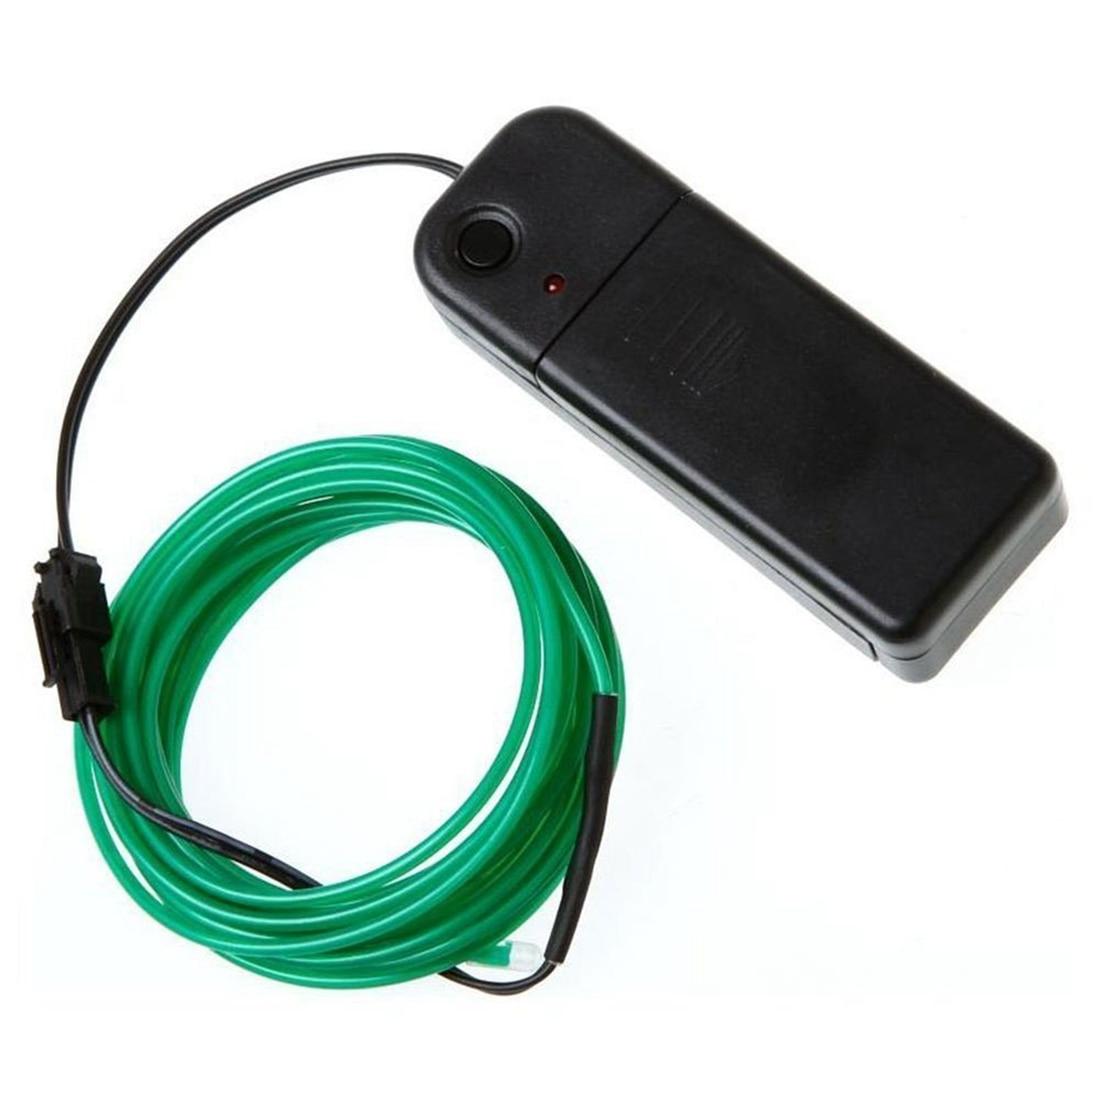 Erfreut El Draht Mit Batteriepack Bilder - Elektrische Schaltplan ...